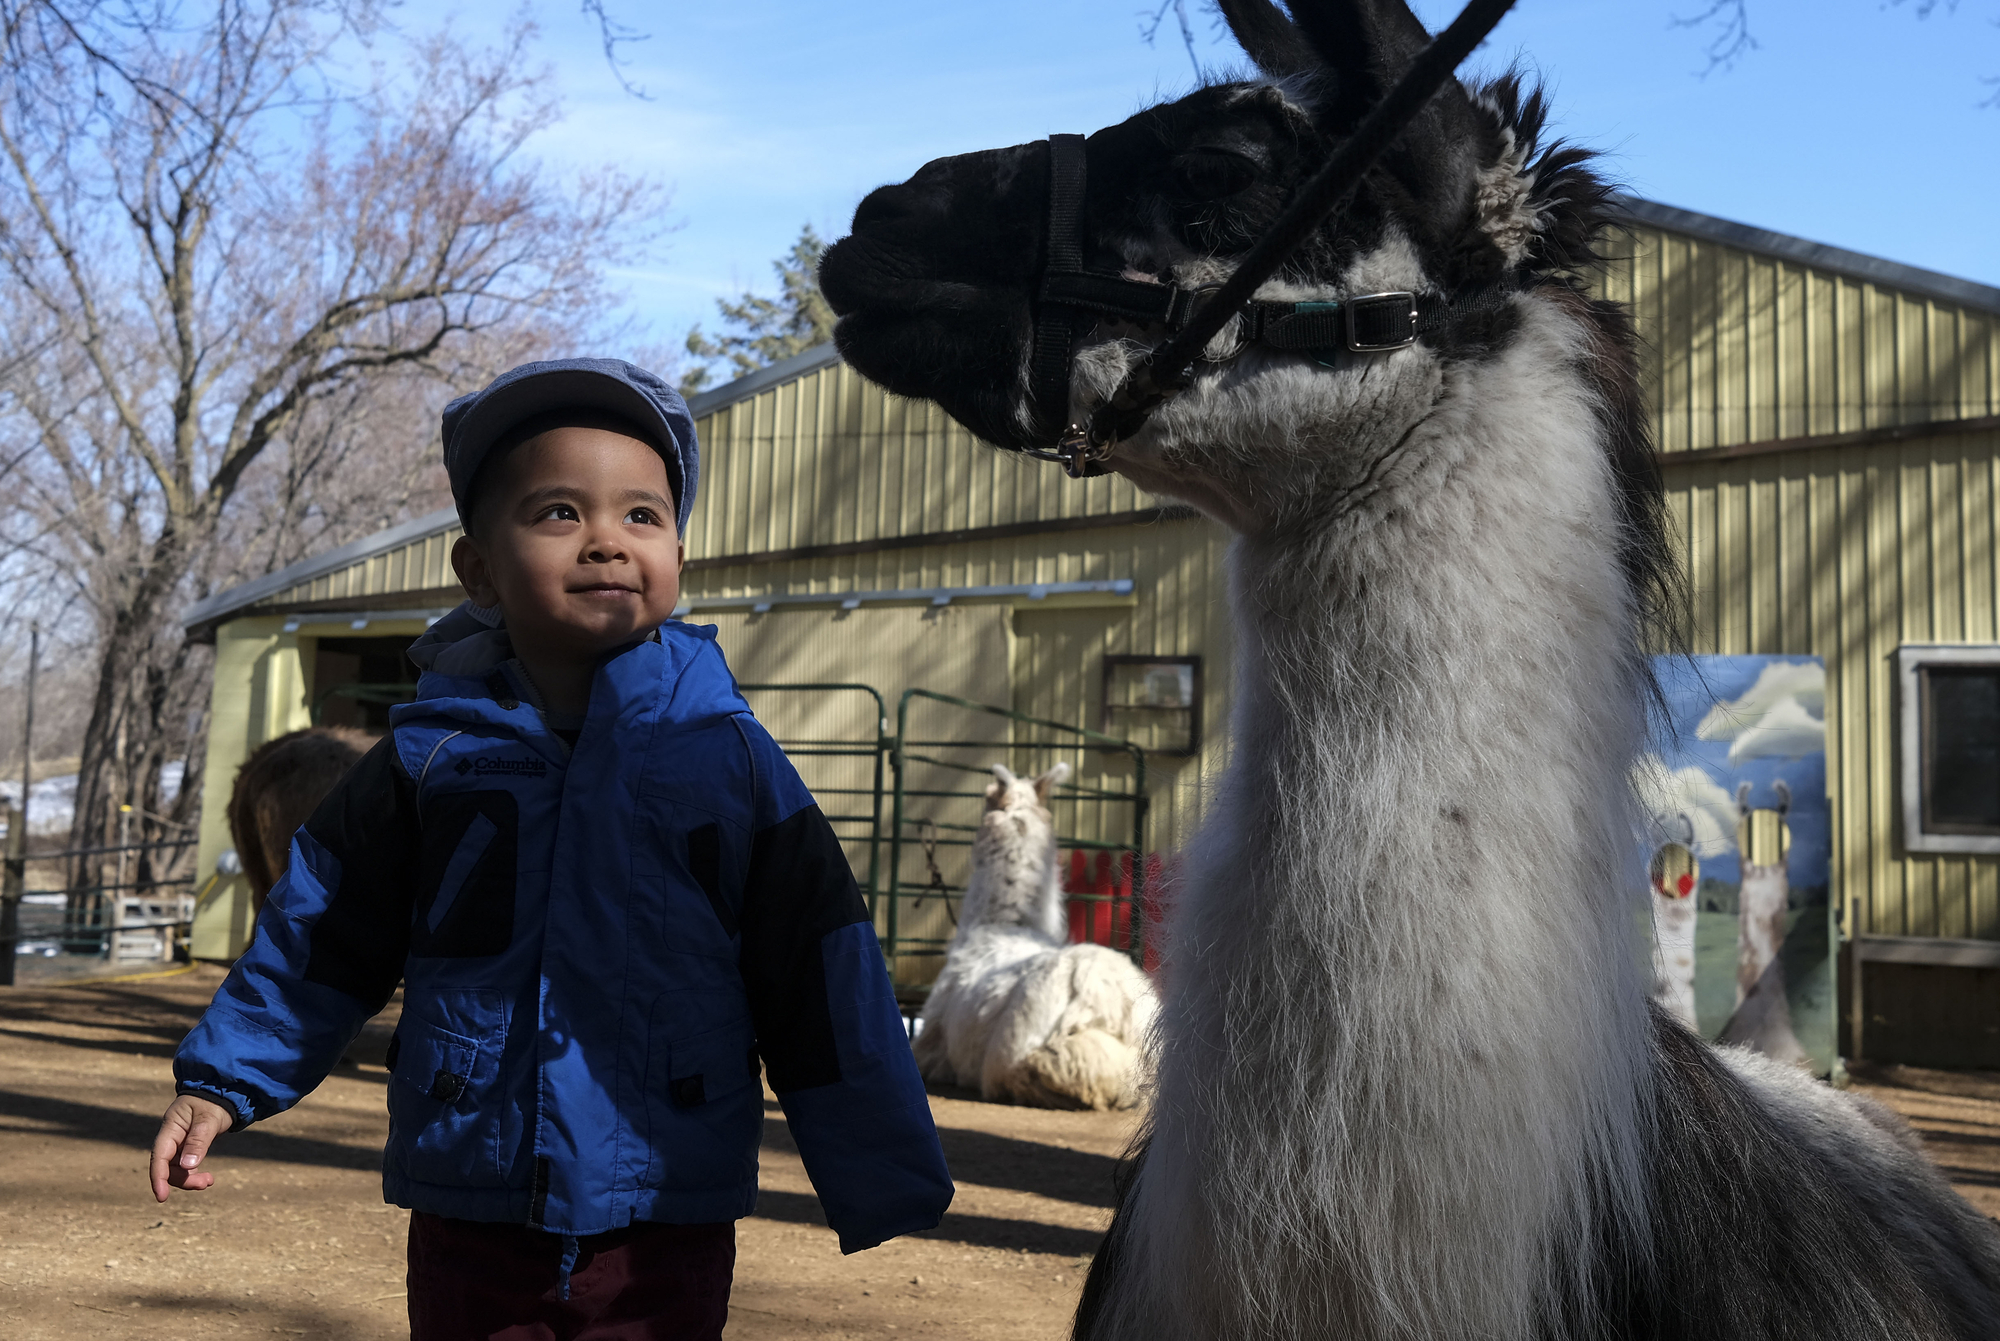 Andrew Maung, 2, of Elk River, looked up at Zorro, one of the llamas at Carlson's Llovable Llamas, while visiting with his parents.